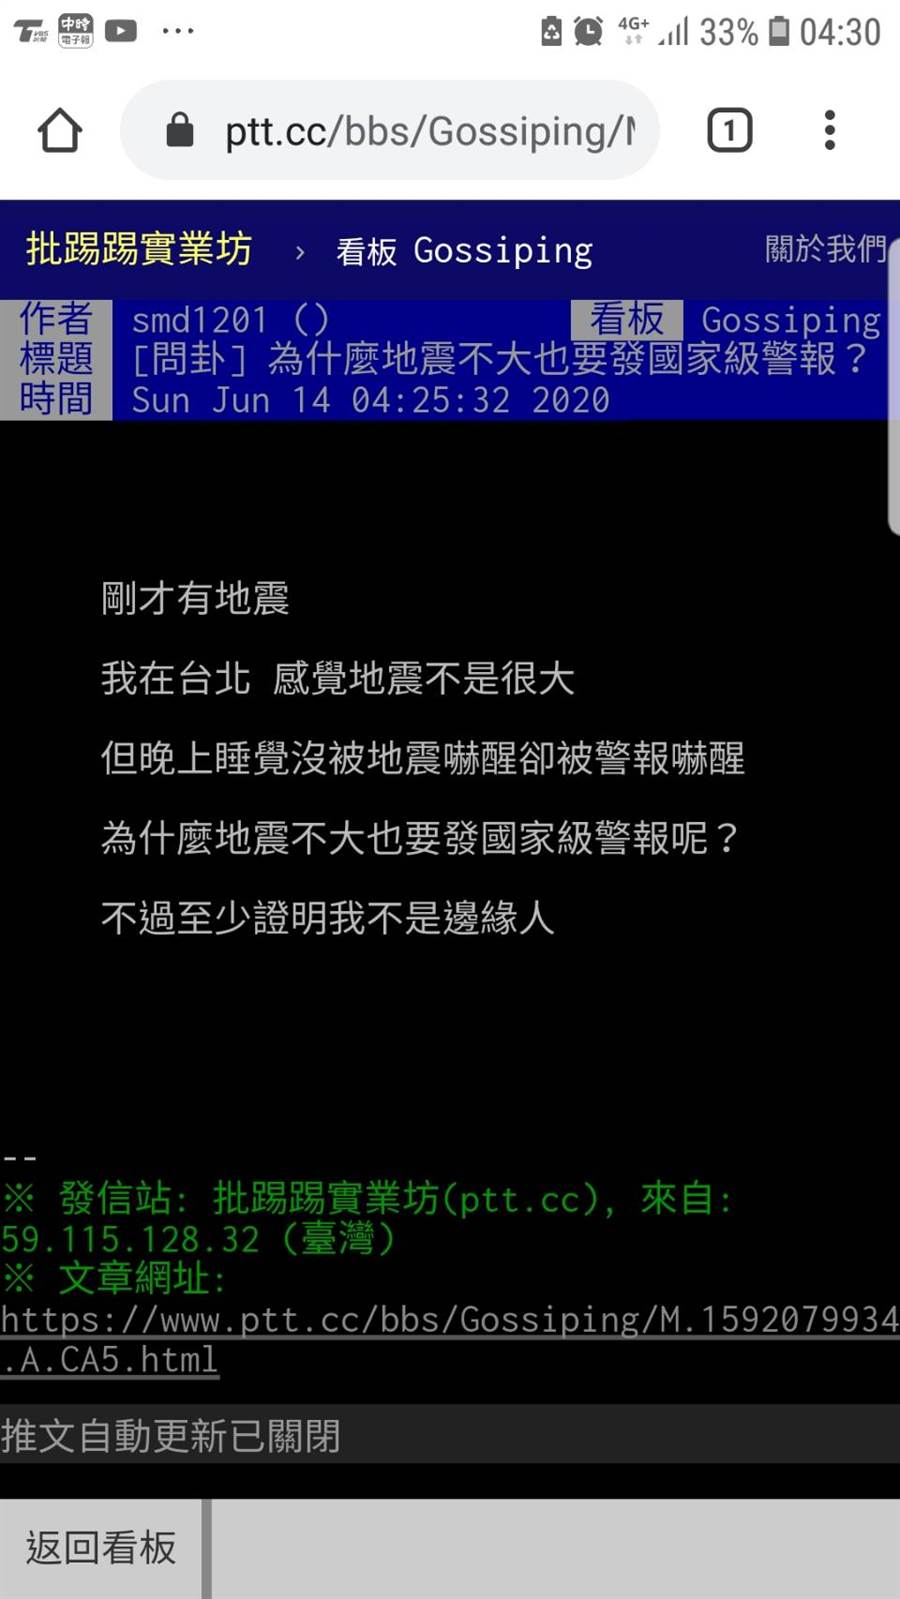 ptt上有鄉民發文,表示沒被地震嚇醒,卻被國家級警報嚇醒。